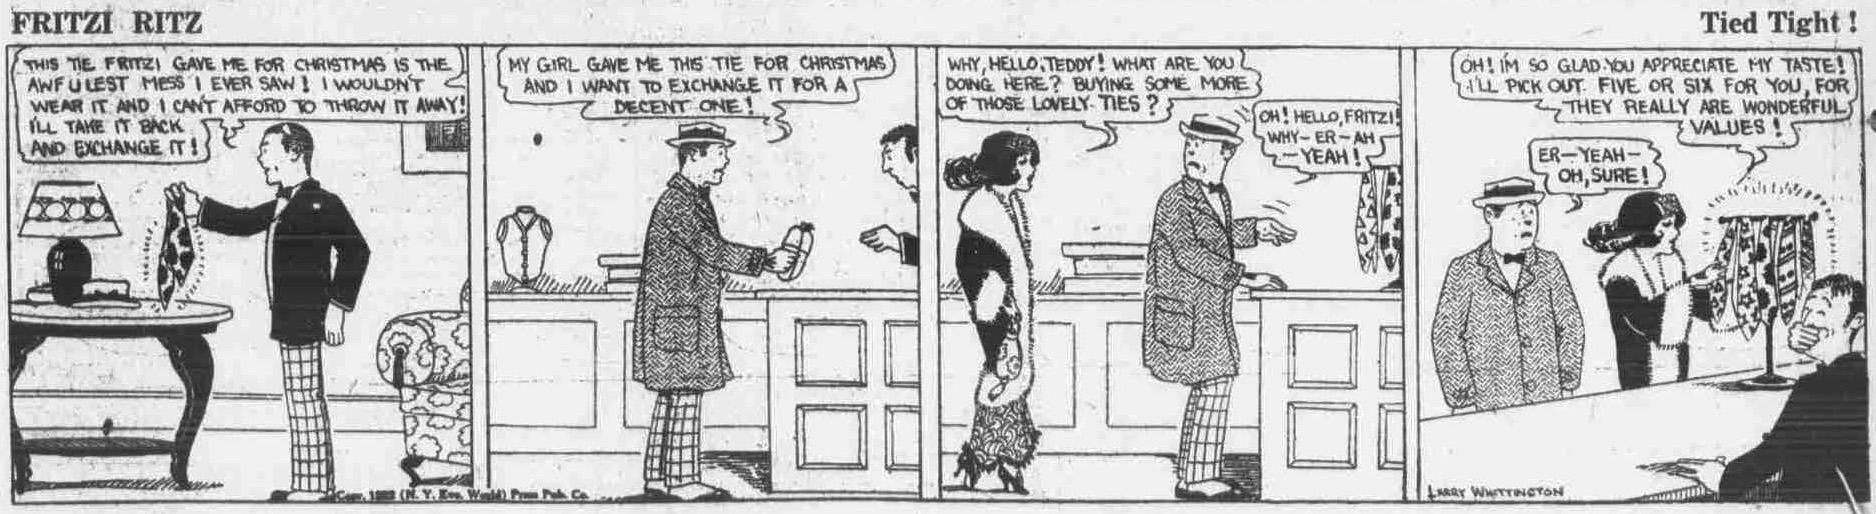 Dec. 26, 1922